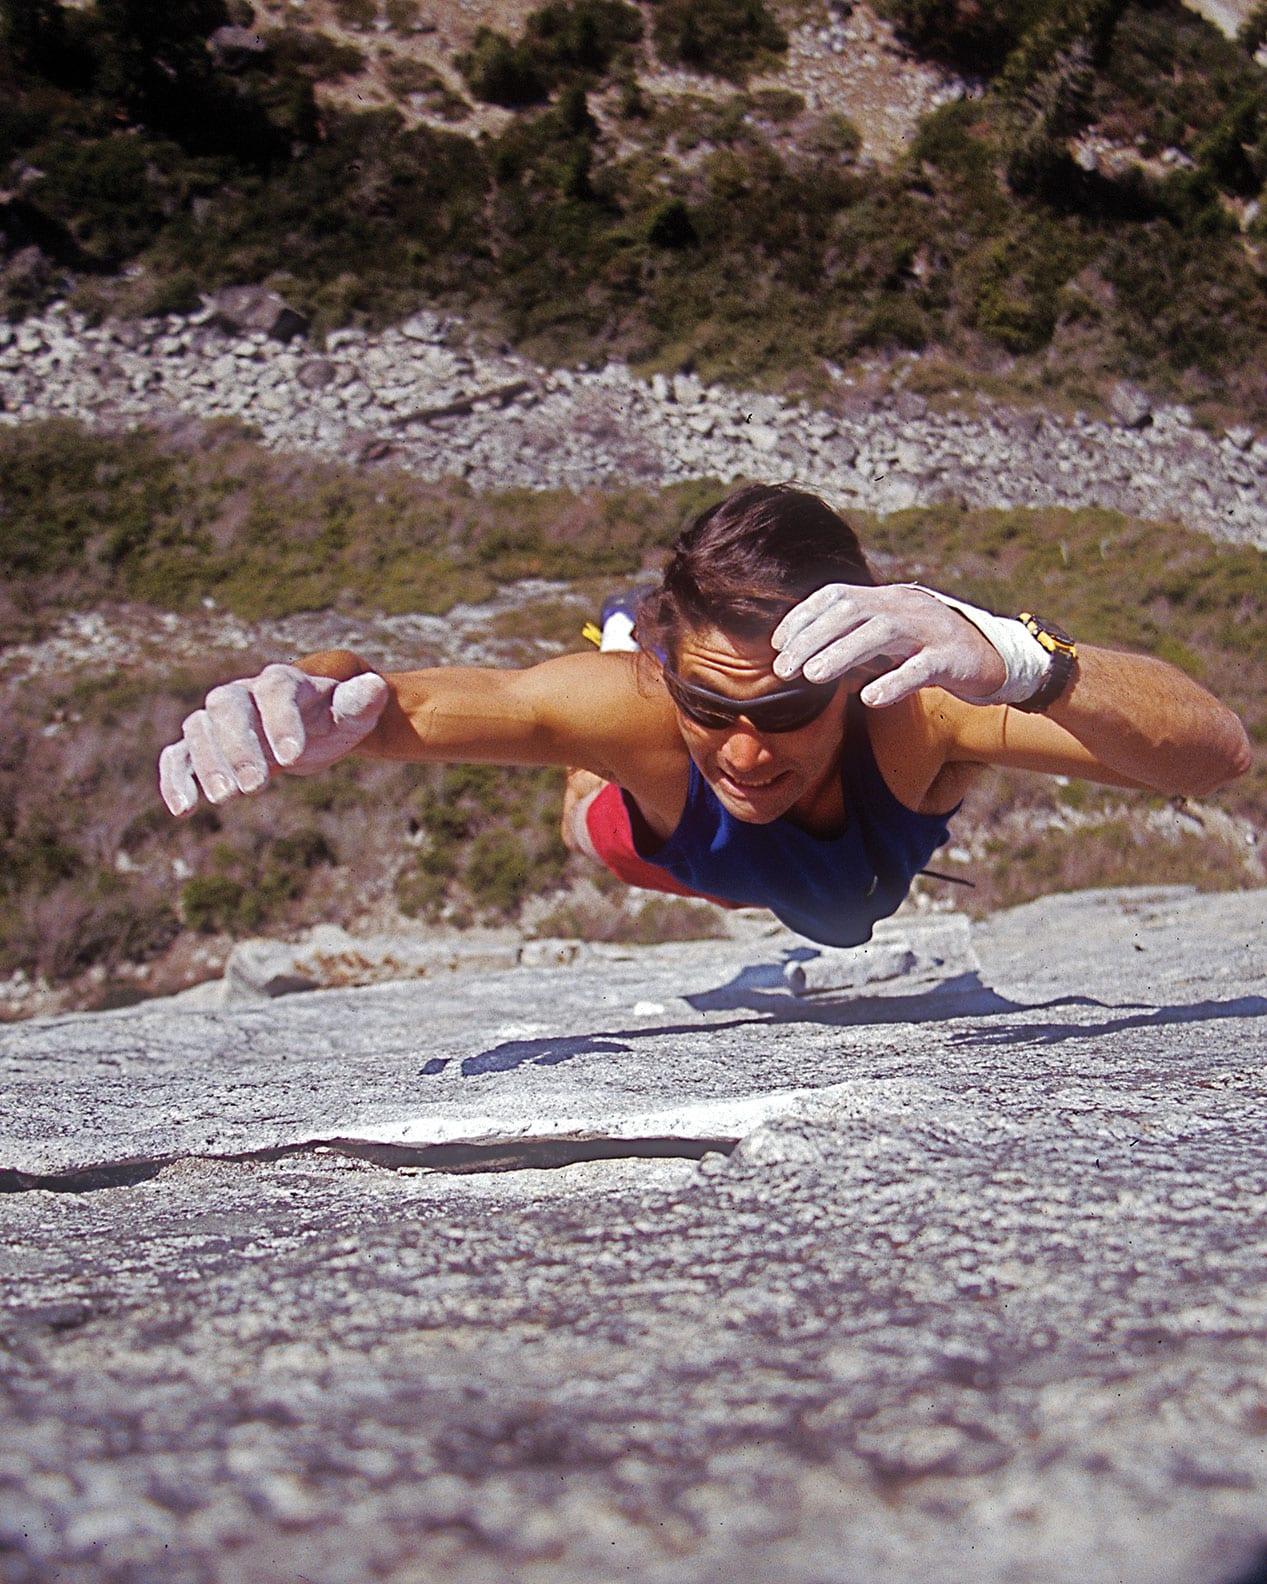 Climber death rock Climber livestreams